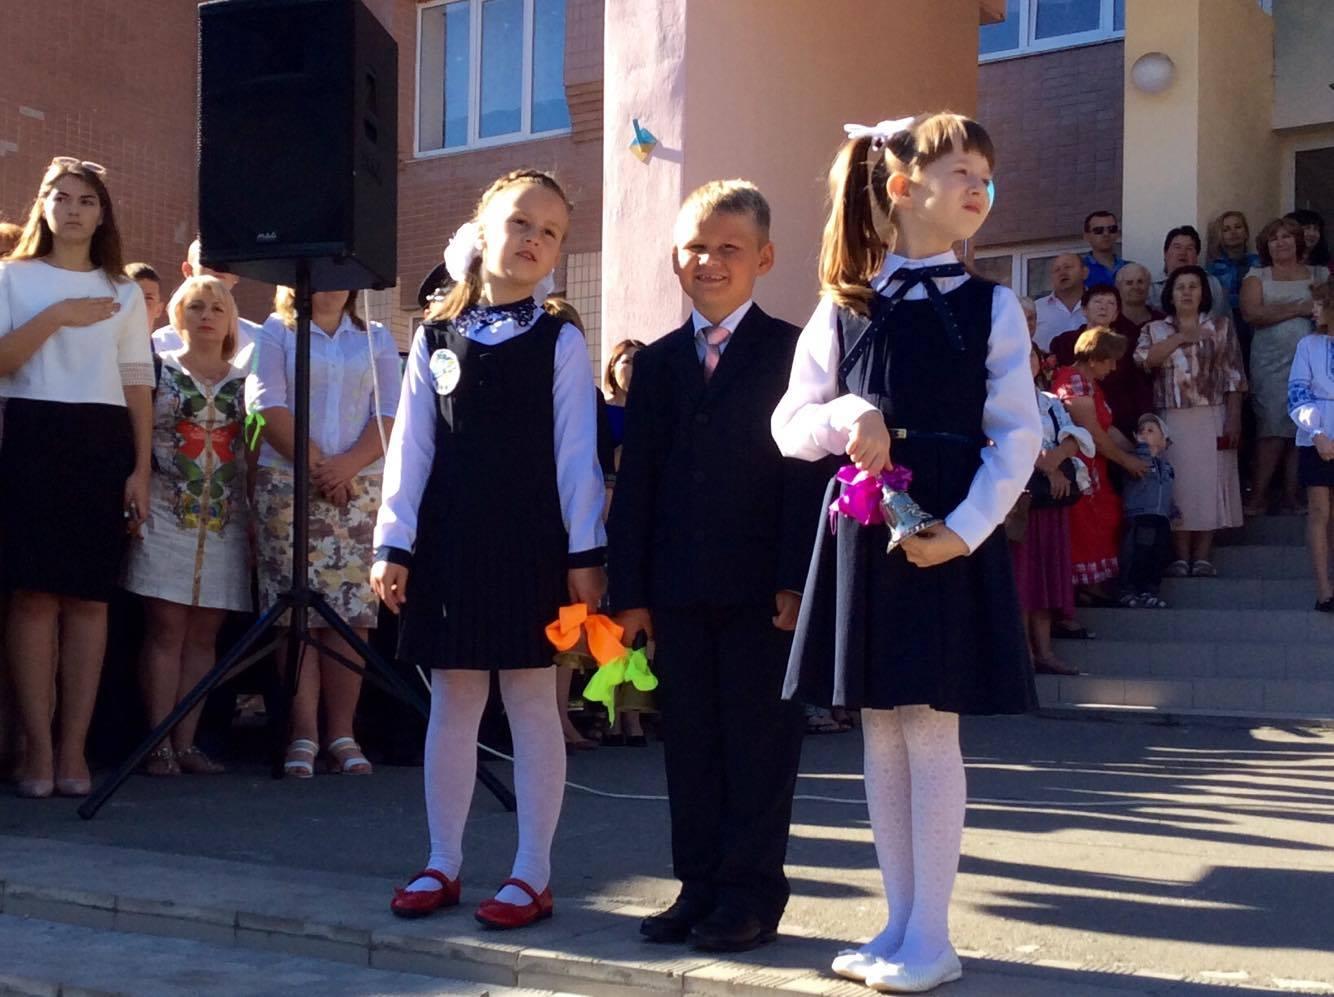 Хмельницький НВК№10 на Першовересень заполонили поліцейські - фото 3